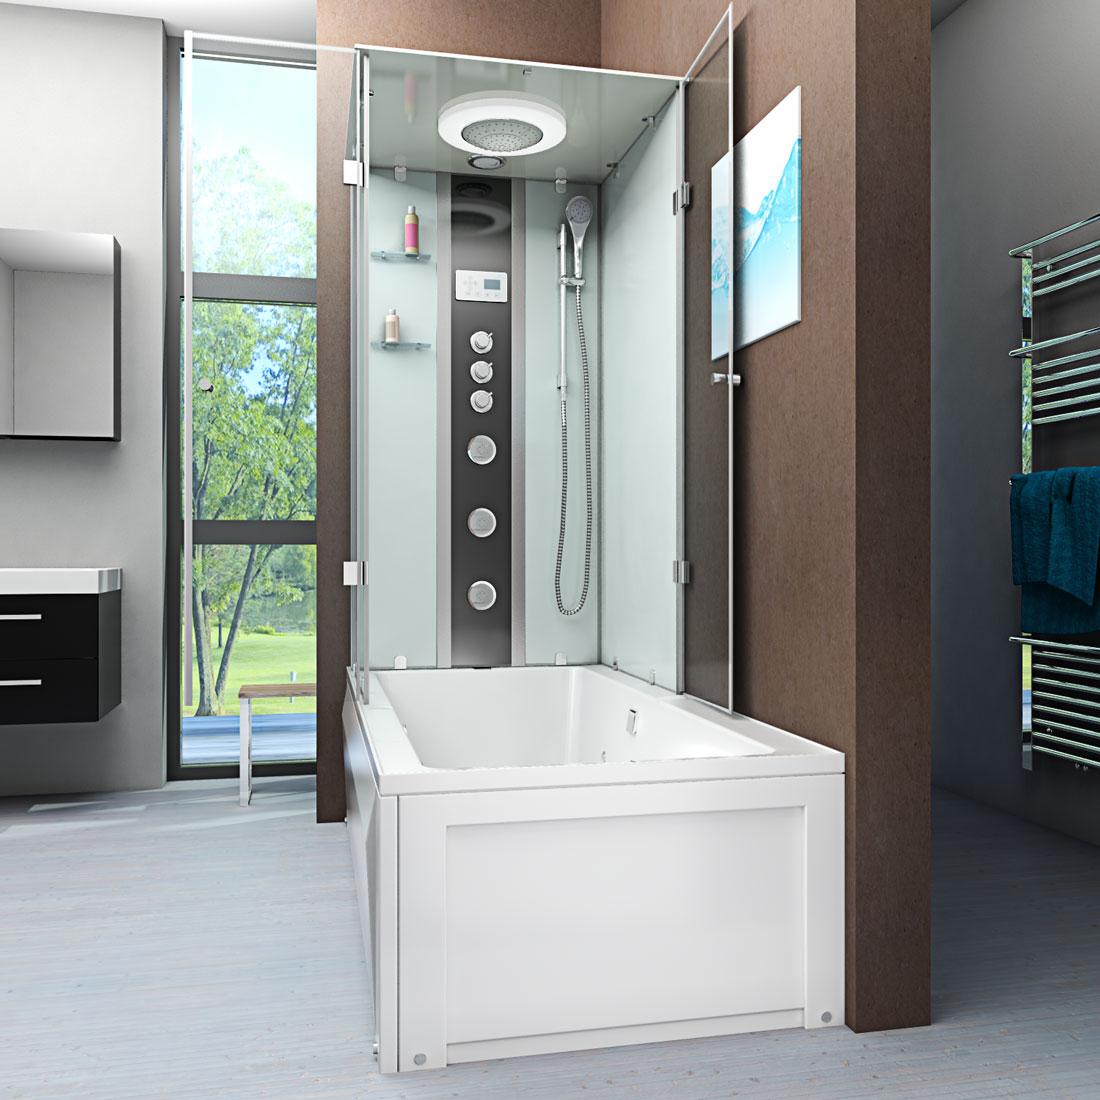 acquavapore dtp50 a005r dusch wannen kombi in 90x180cm trendbad24. Black Bedroom Furniture Sets. Home Design Ideas